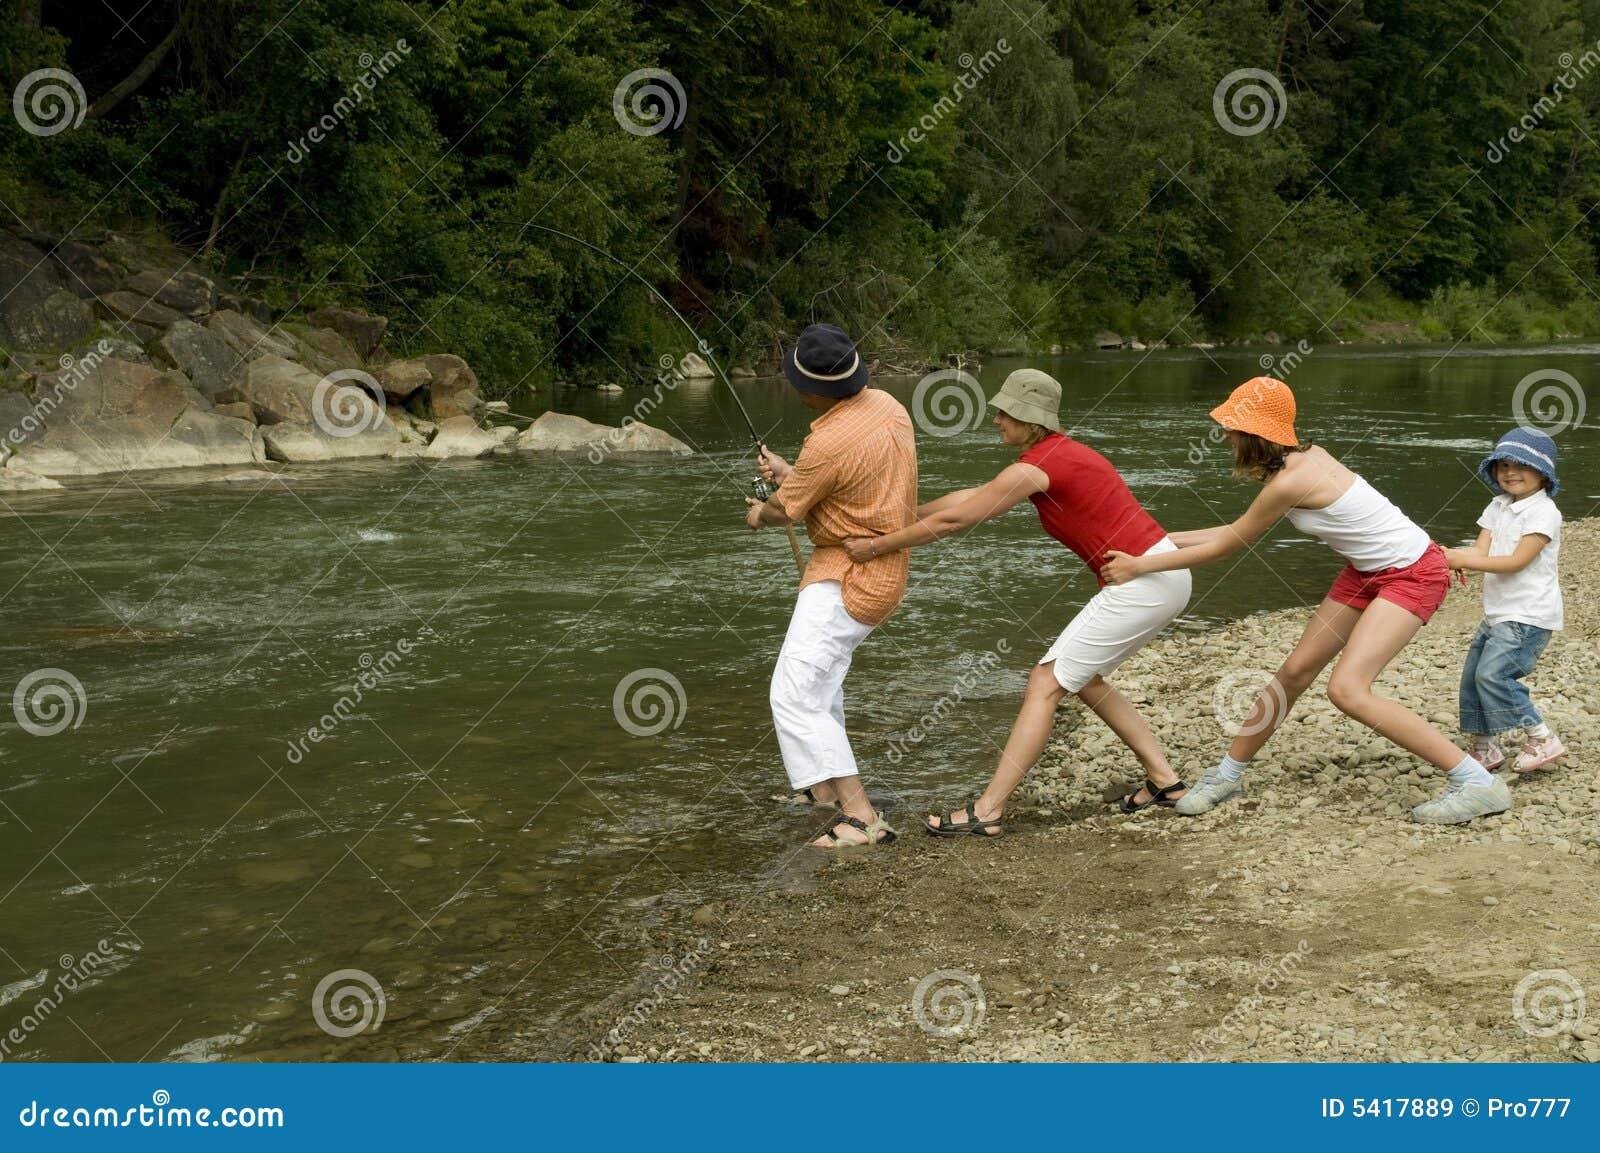 Family fishing team